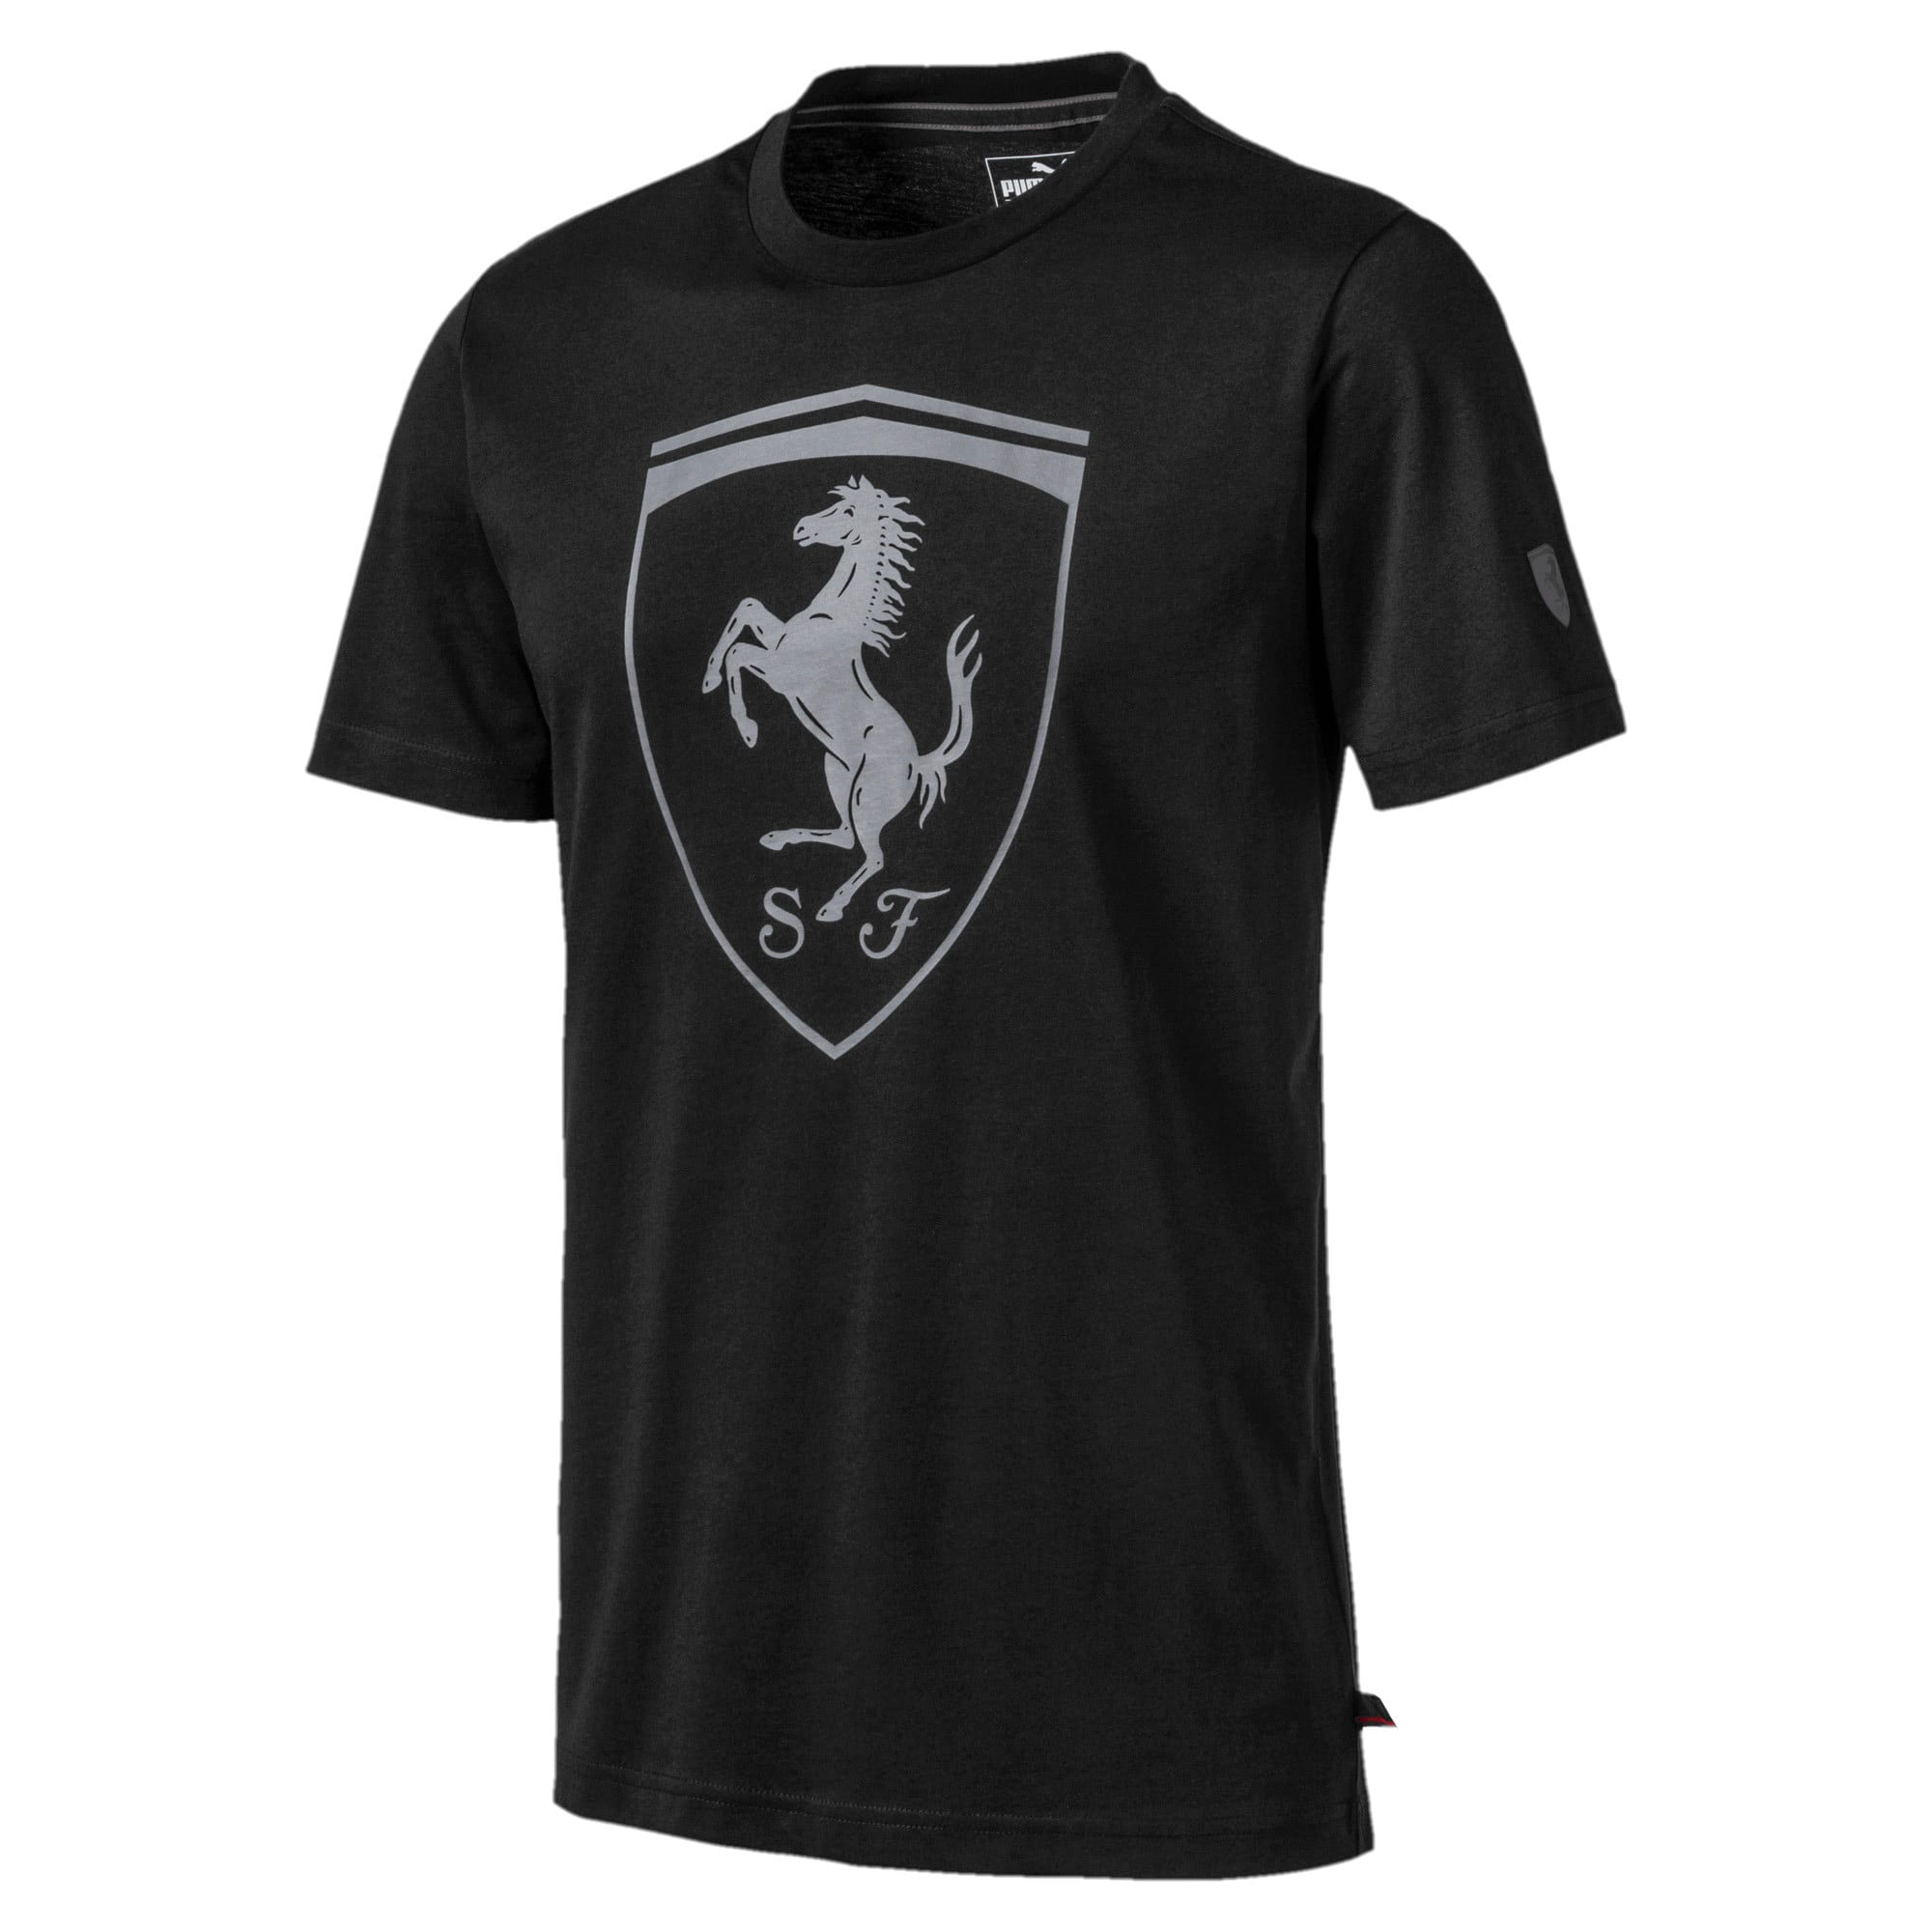 Miniatura 1 de Camiseta con escudo Ferrarigrande, para hombre, Puma Black, mediano